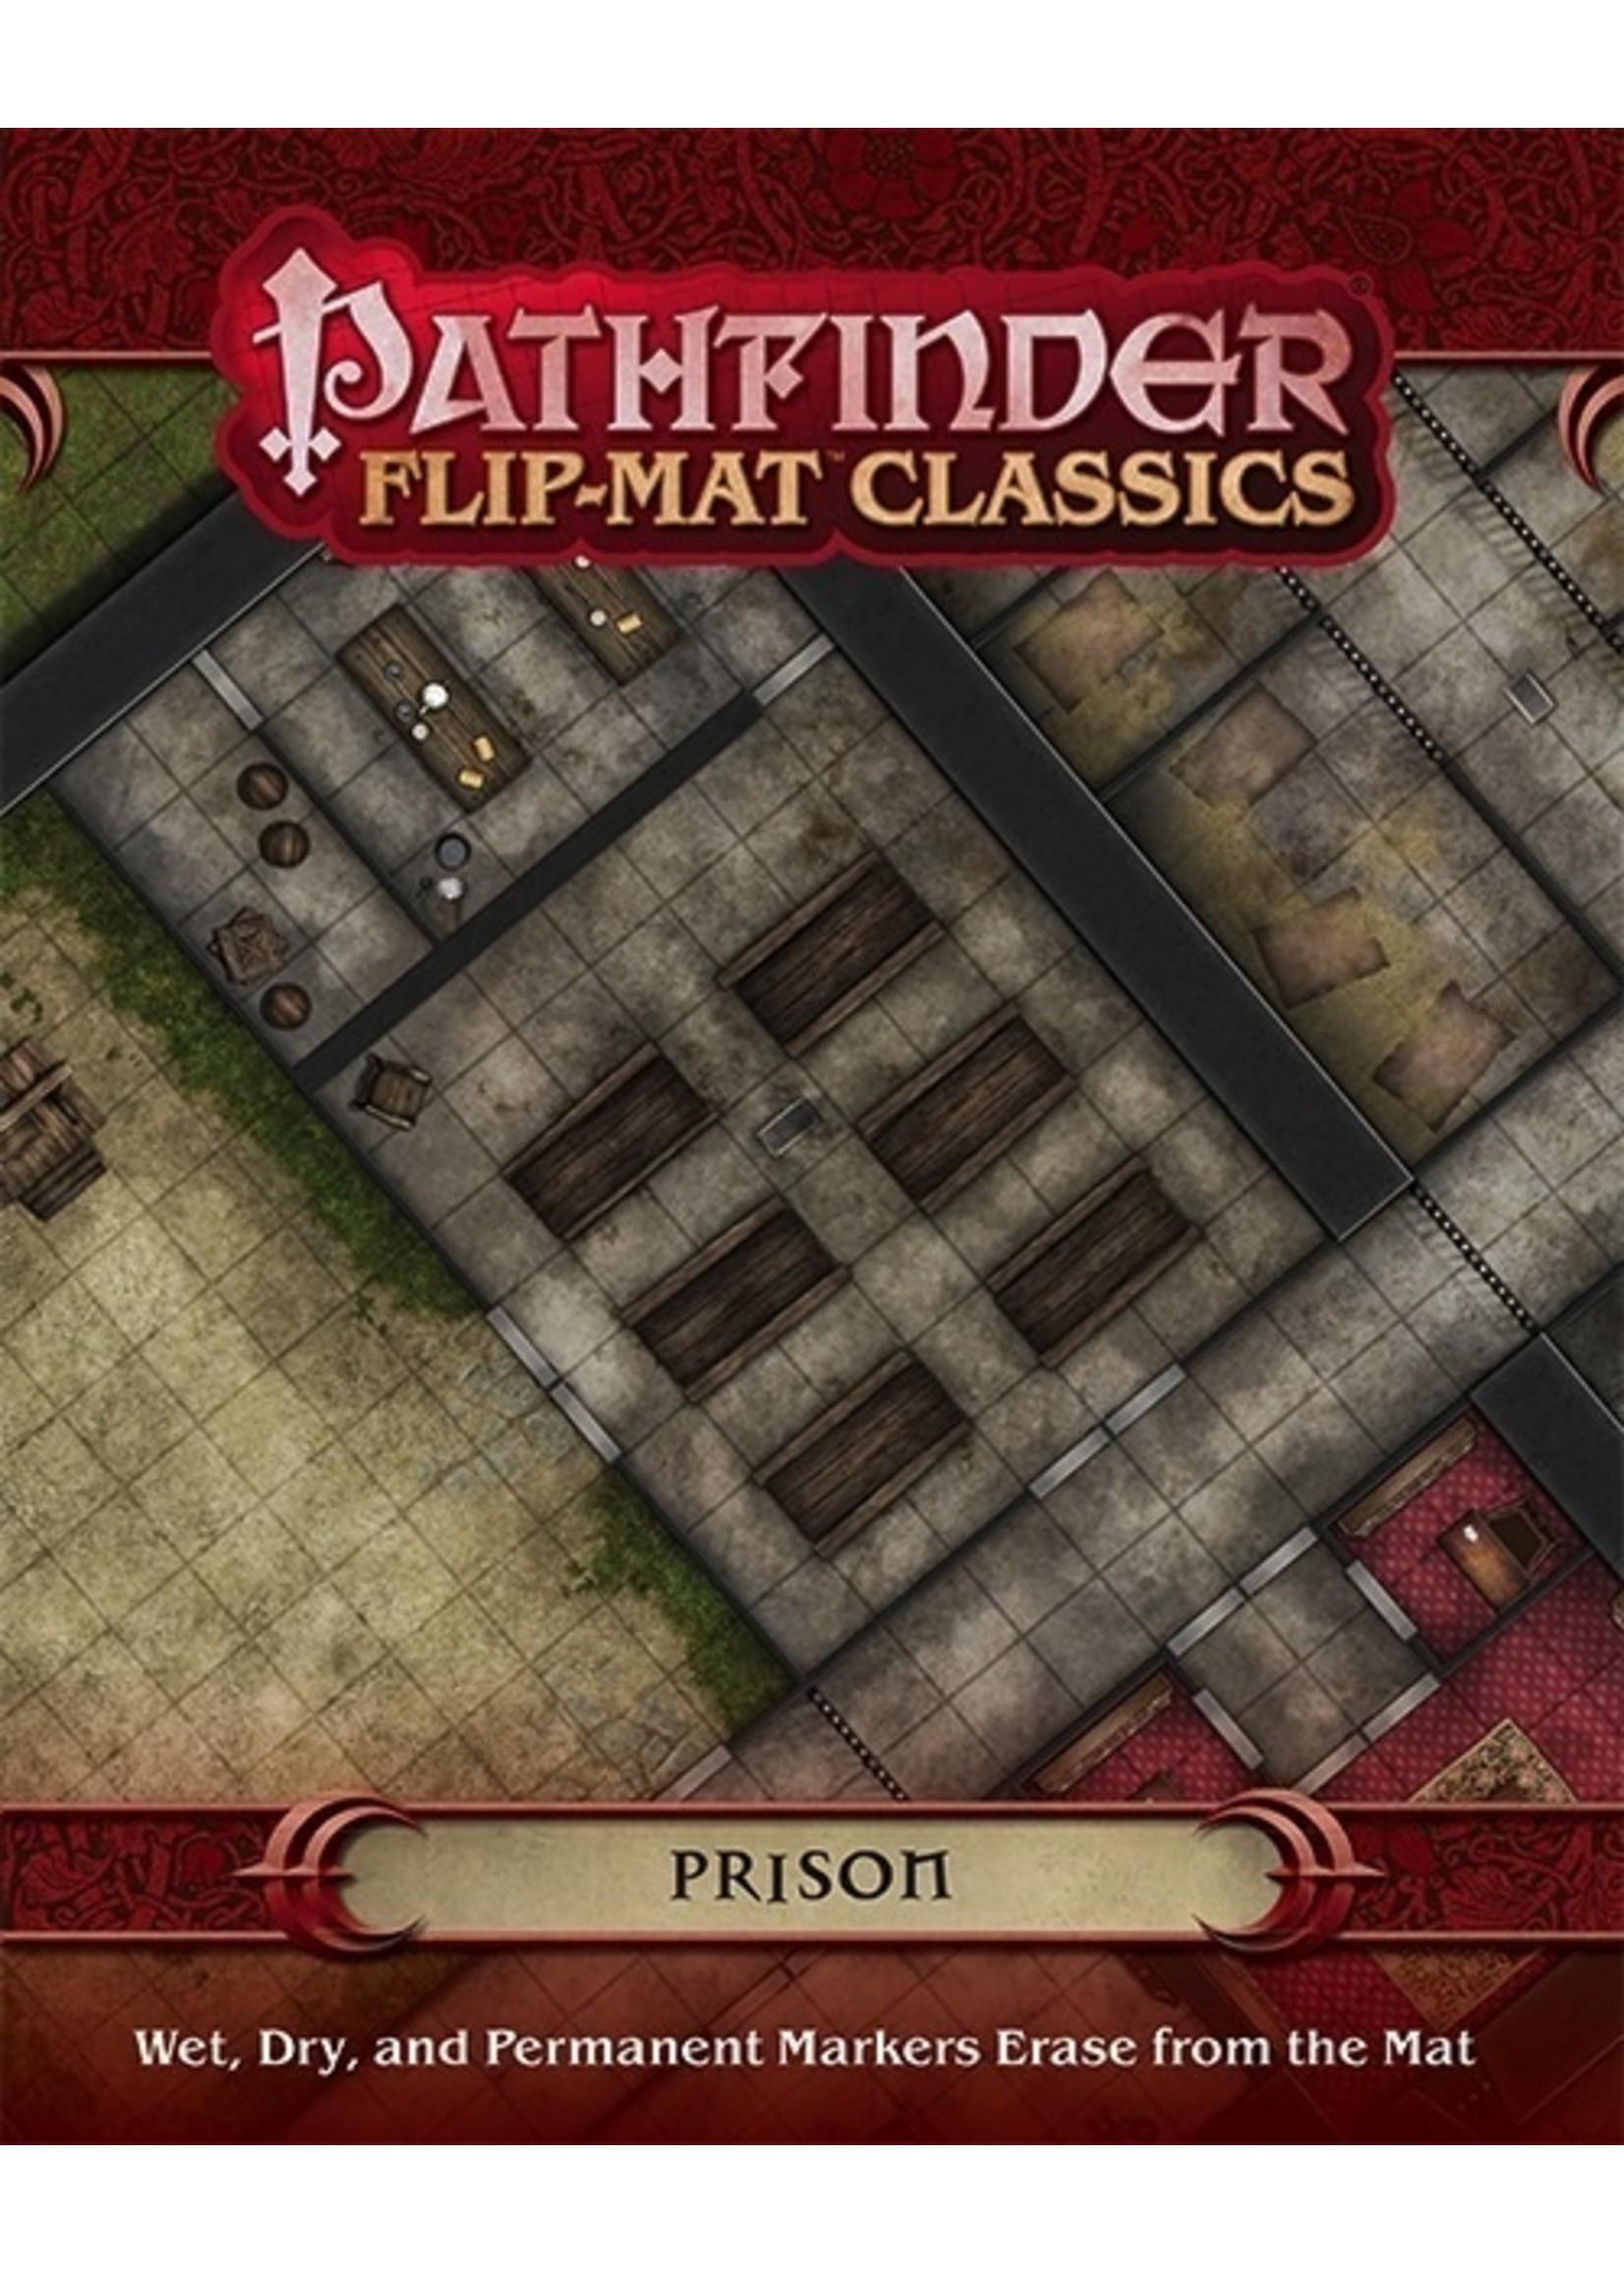 Pathfinder RPG: Flip-Mat - Classics - Prison